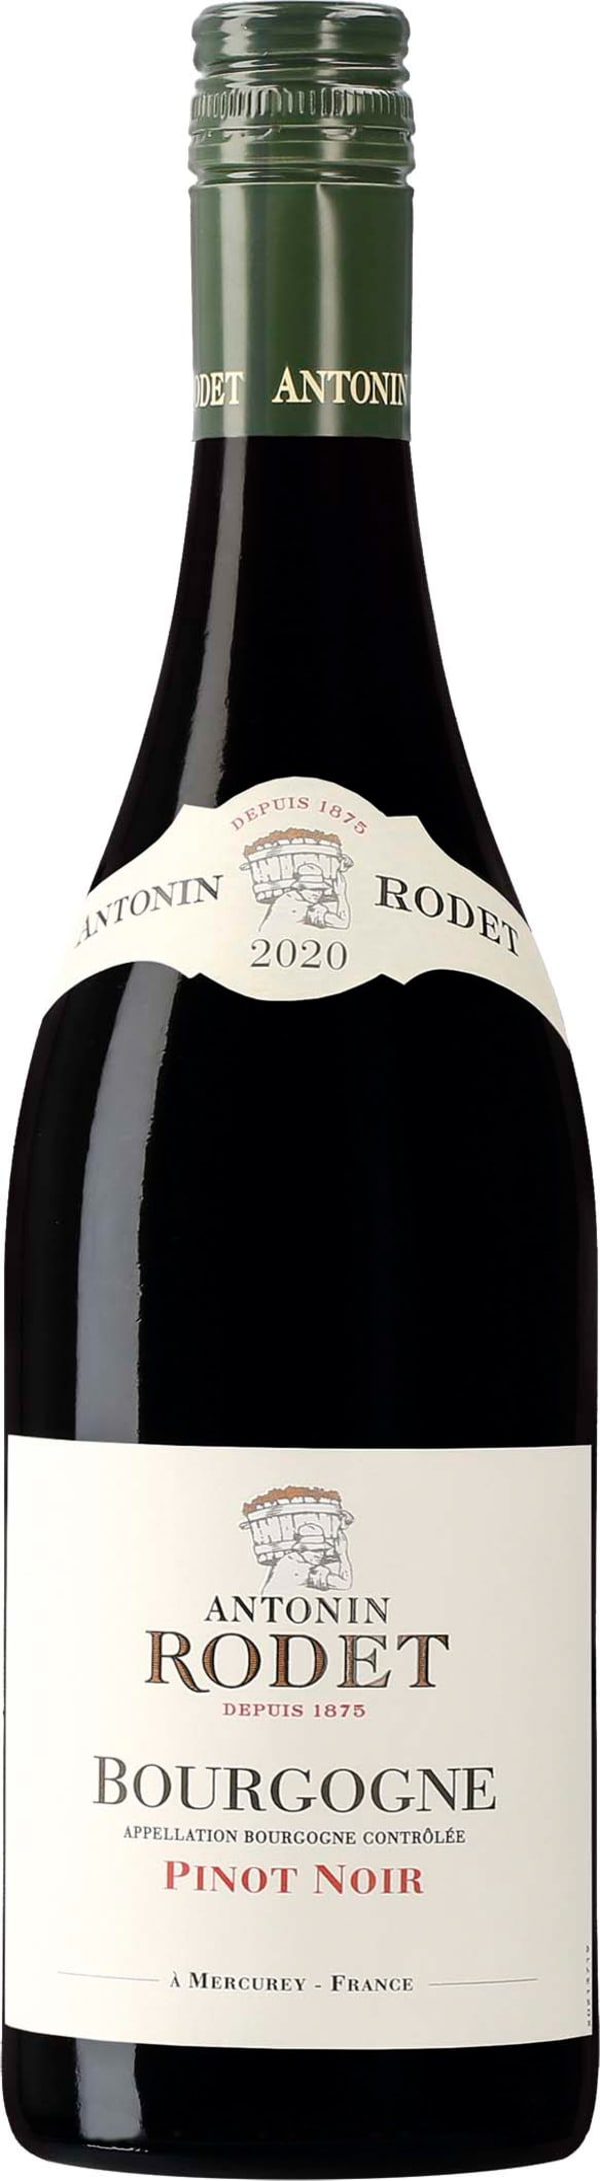 Antonin Rodet Pinot Noir 2014